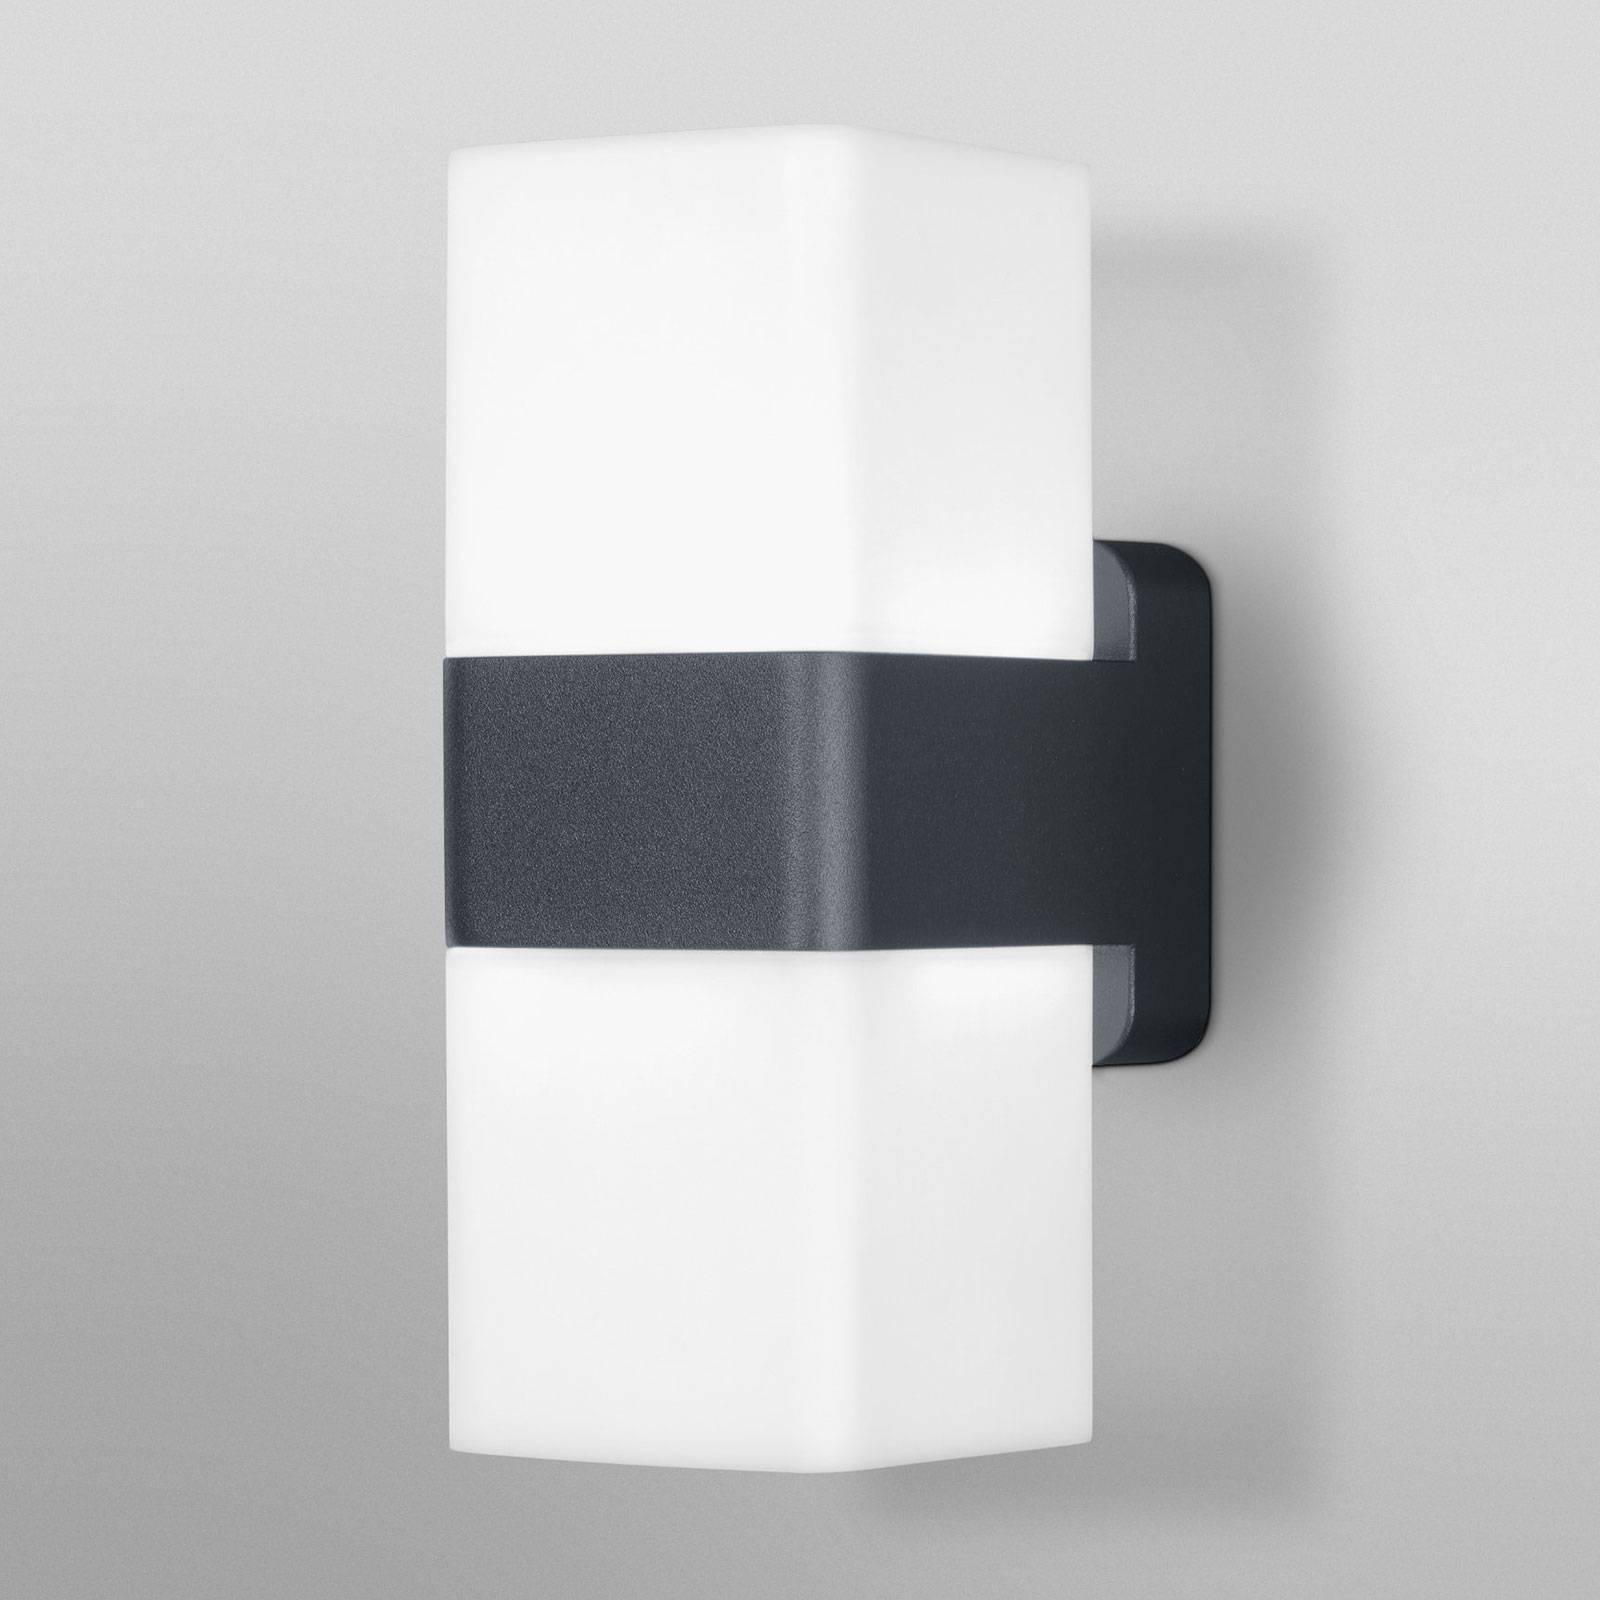 LEDVANCE SMART+ WiFi Cube wandlamp RGBW up/down